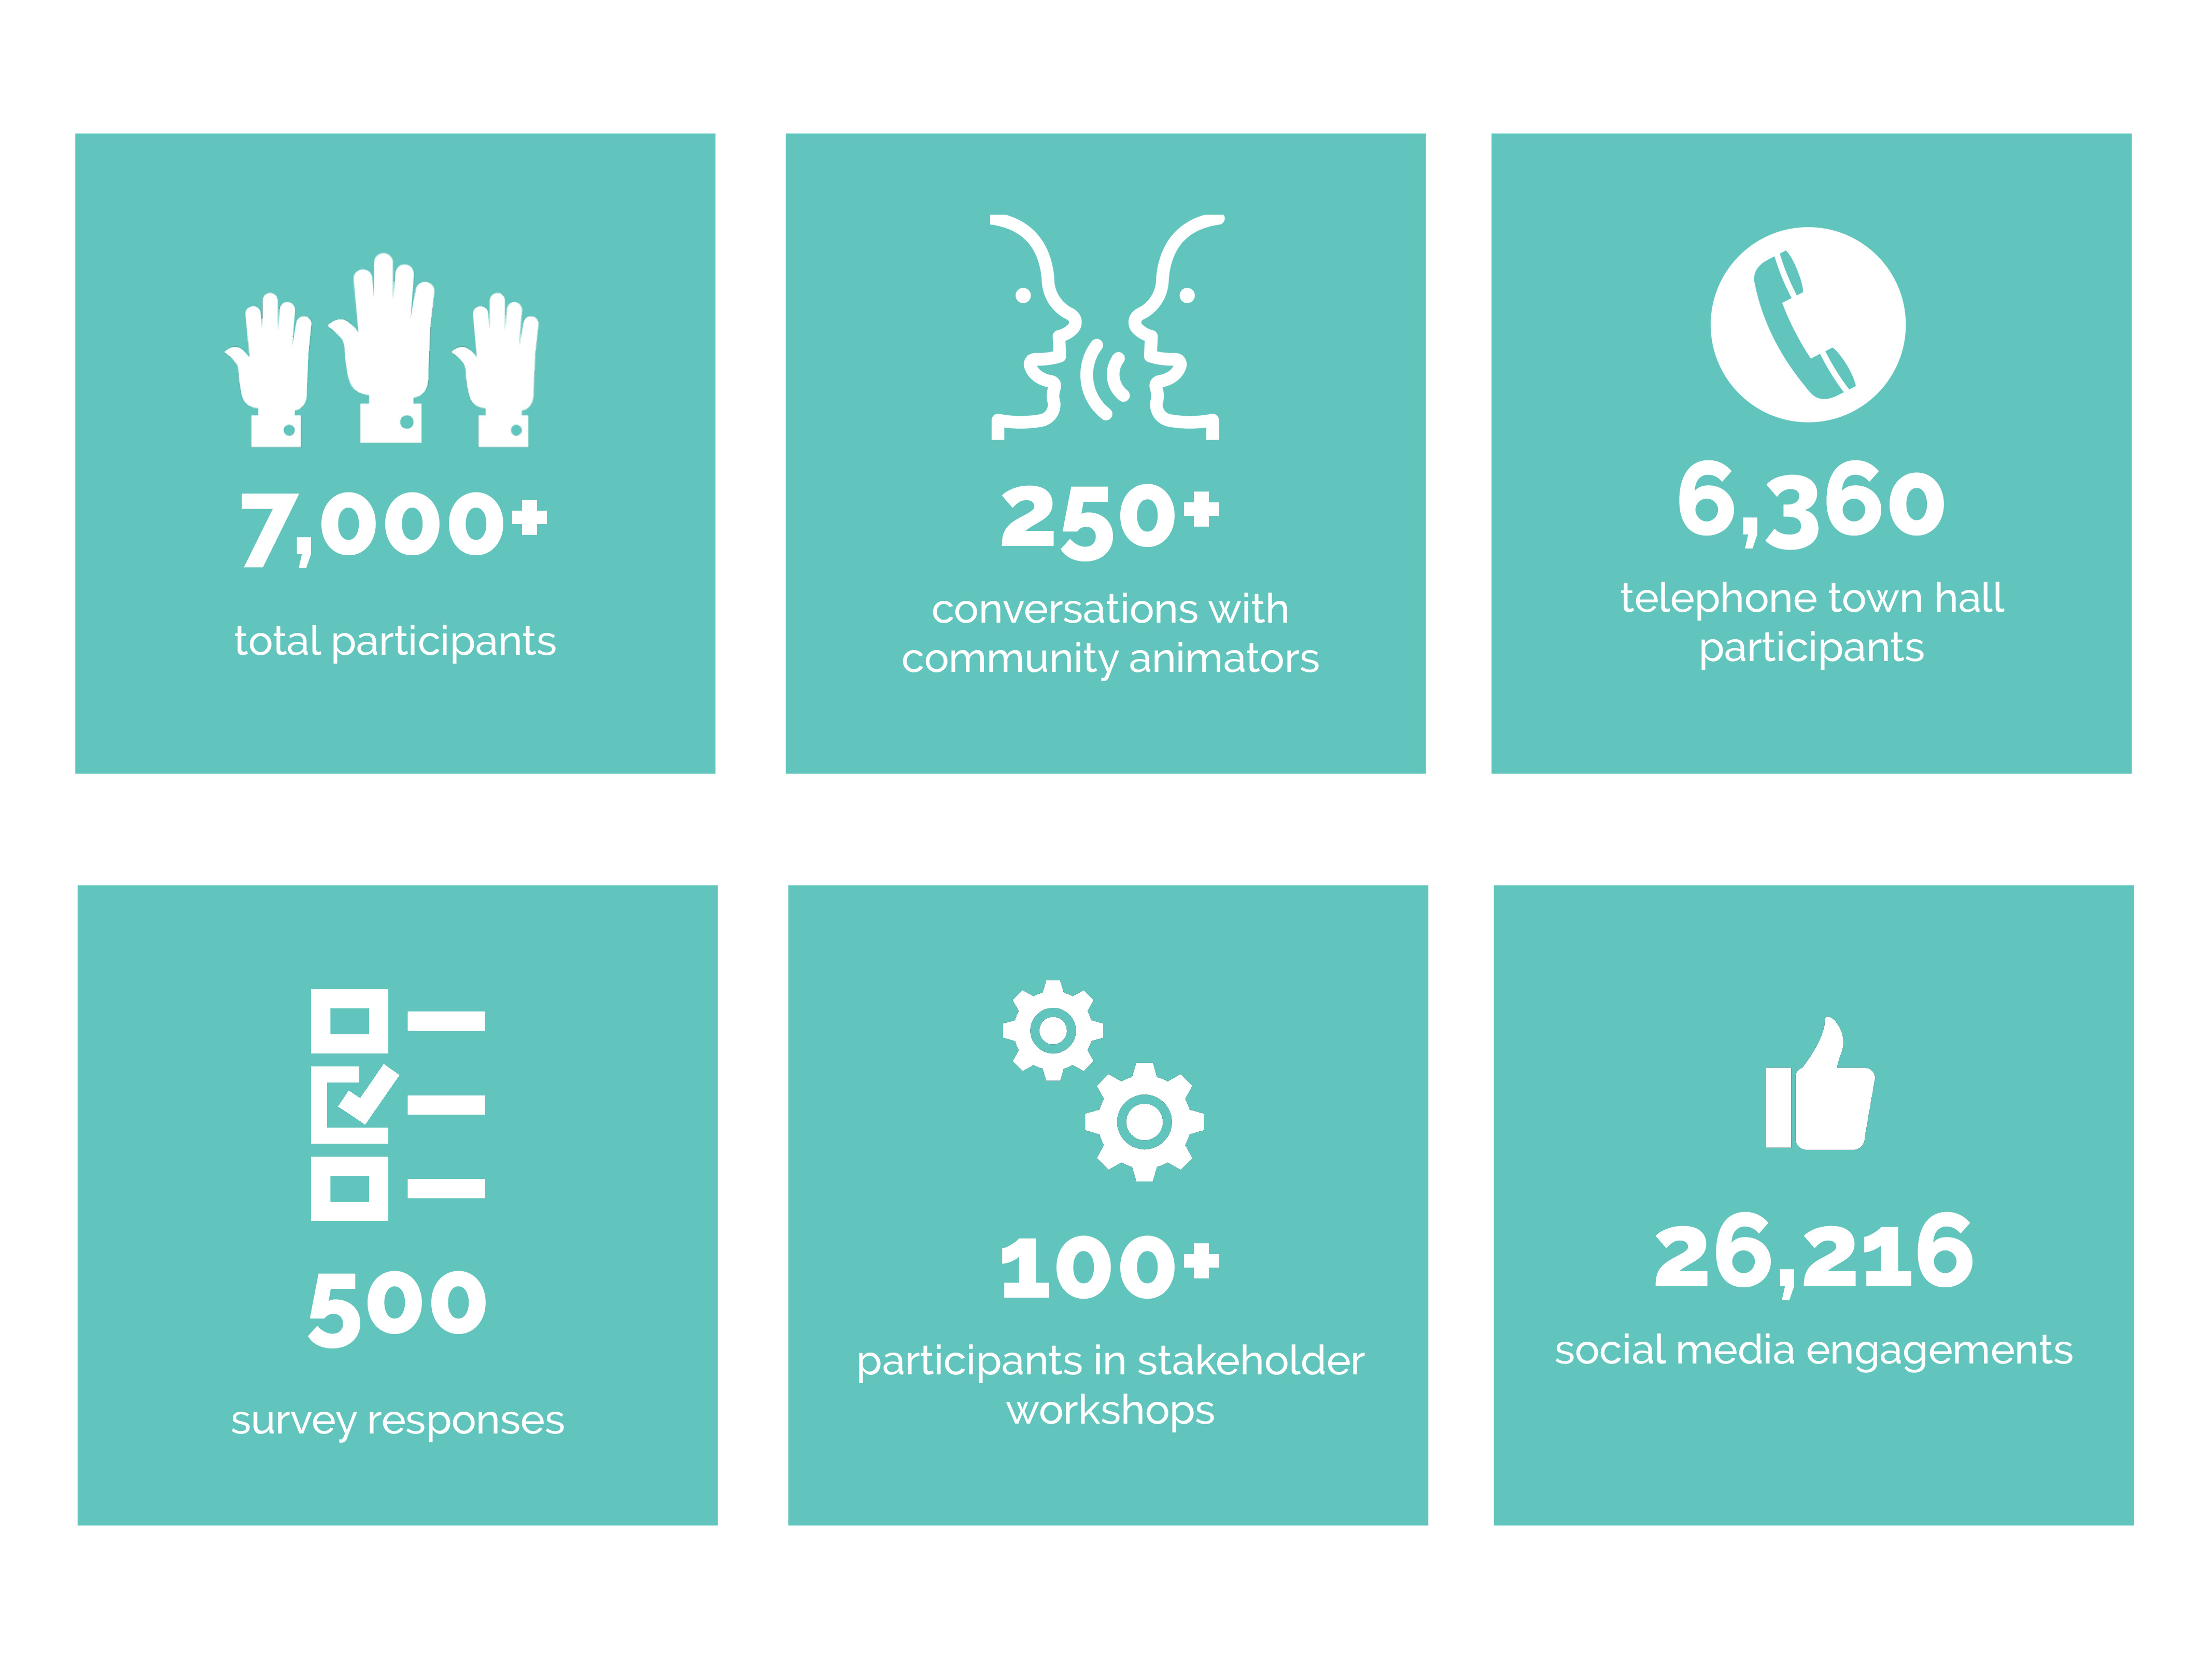 7,000+ total participants; 250+ conversations with community animators; 6,360 town hall participants; 500 survey responses; 100+ participants in stakeholder workshops; 26,126 social media engagements